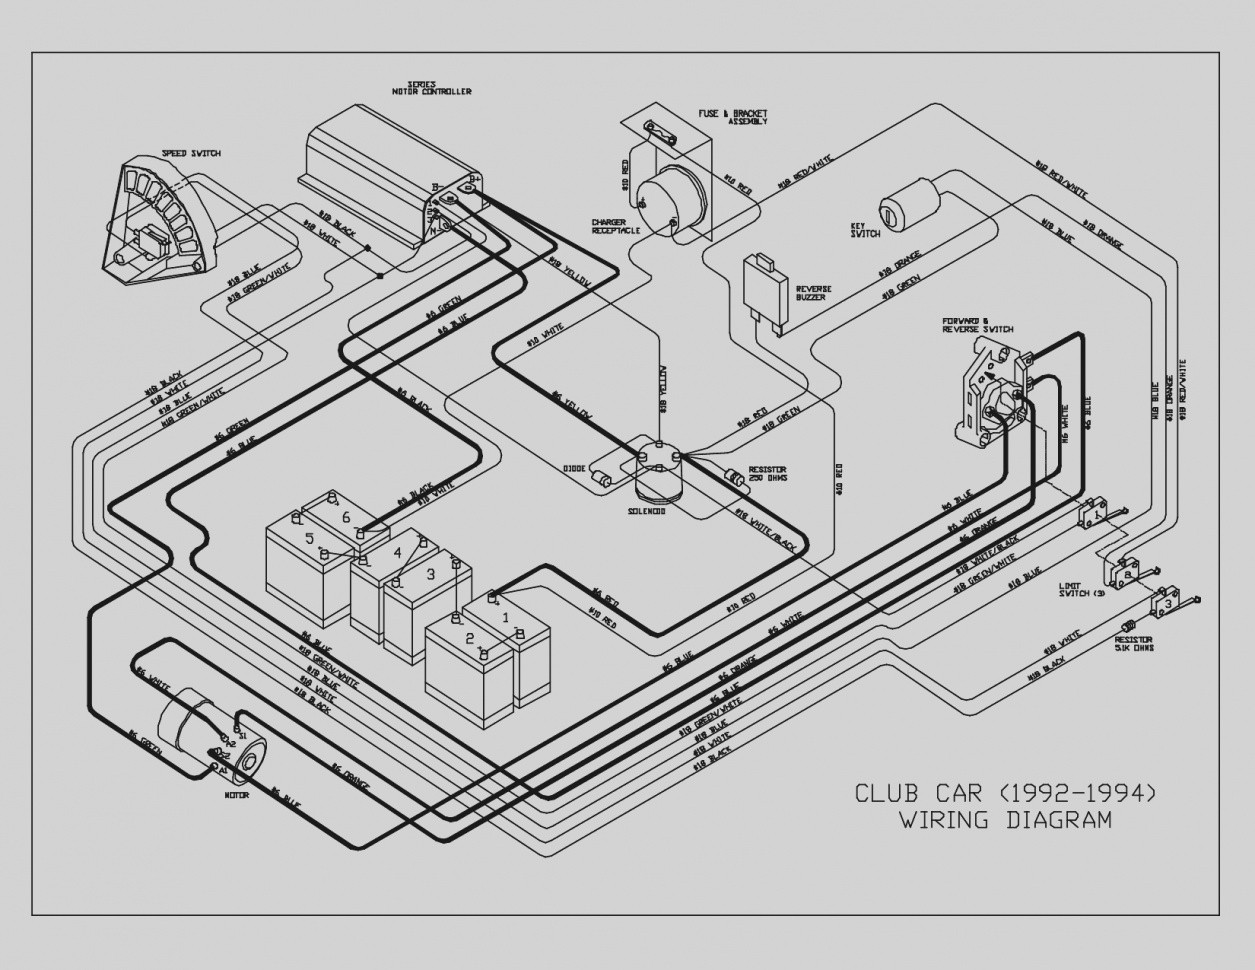 Wiring Diagram 36 Volt Battery Charger Library Textron Trend Ez Go Wiringam Ezgo Rxv Gas Golf Cart Club Car